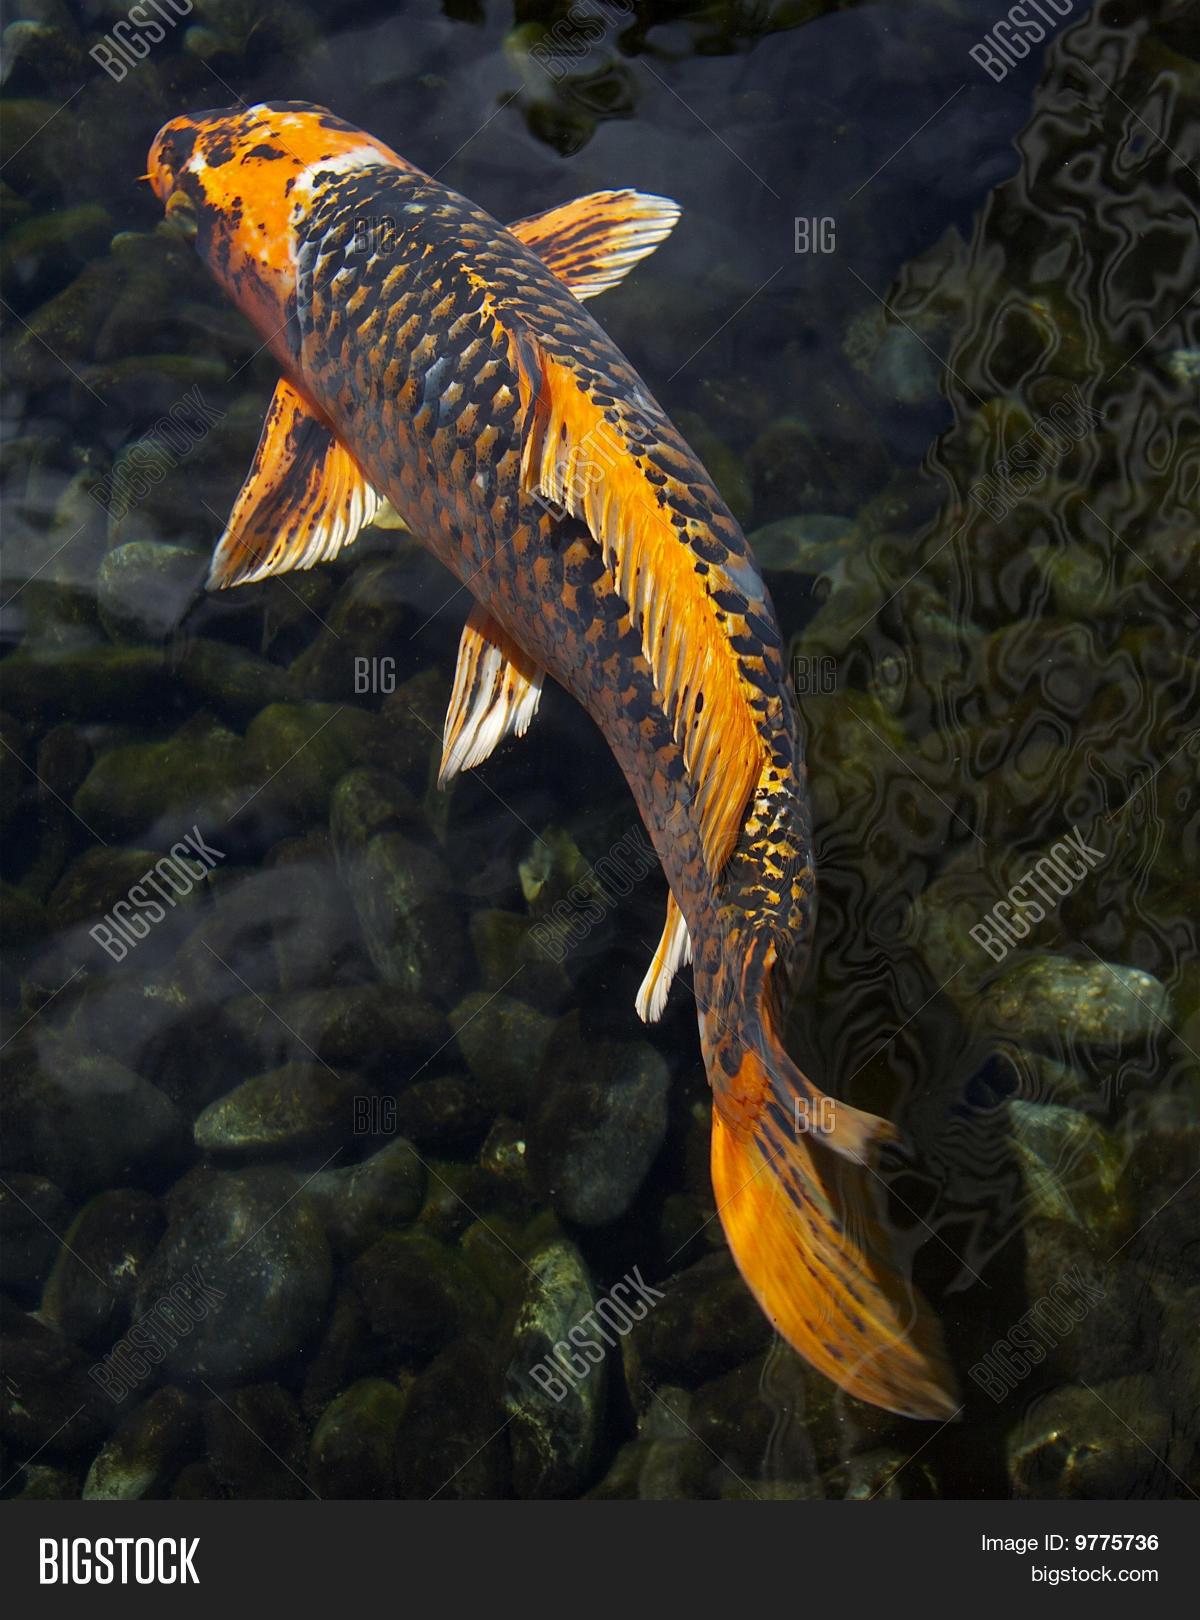 Large orange koi fish image photo free trial bigstock for Carpe koi orange